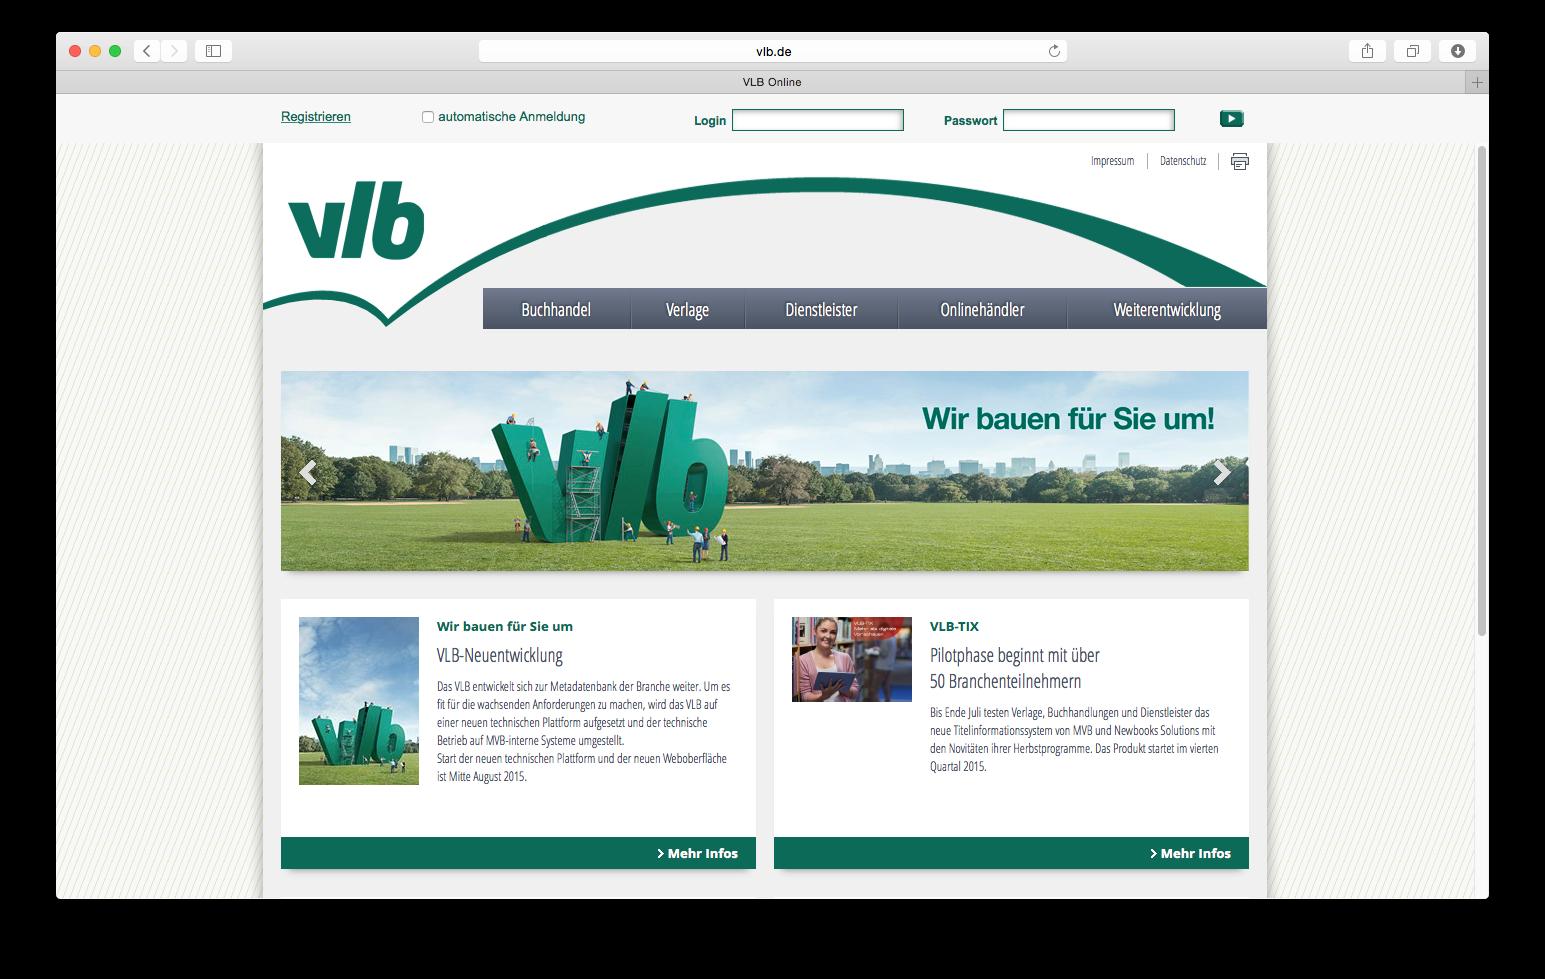 VLB_Website